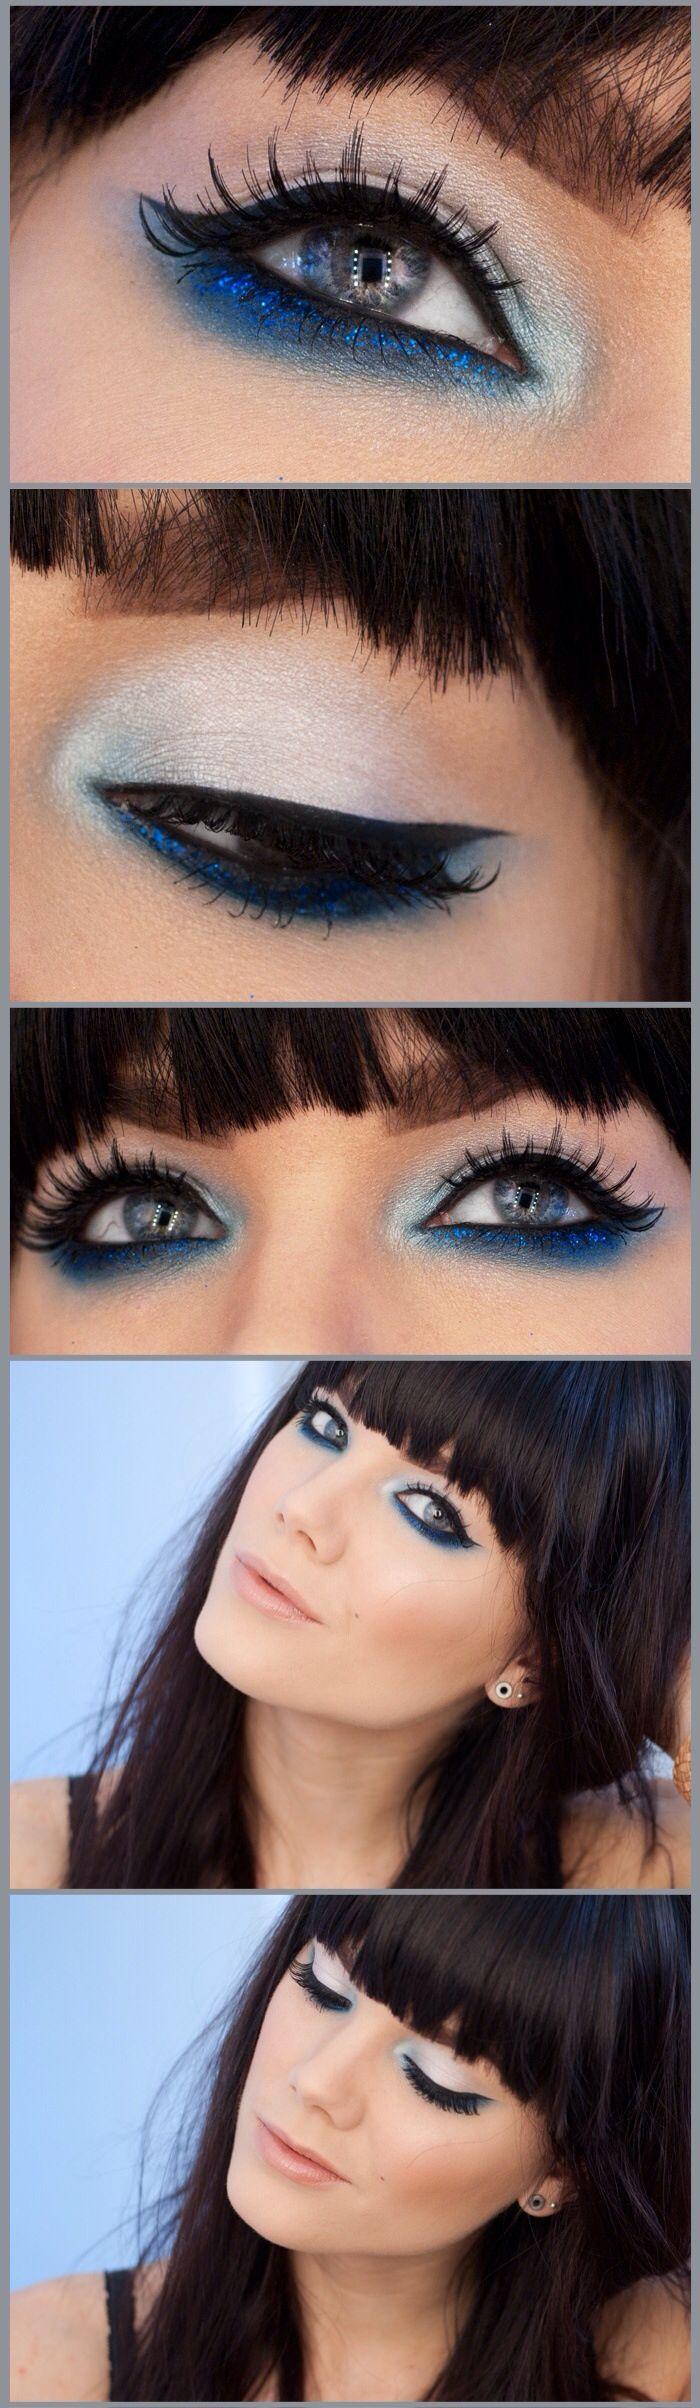 best makeup images on pinterest makeup ideas maquiagem and